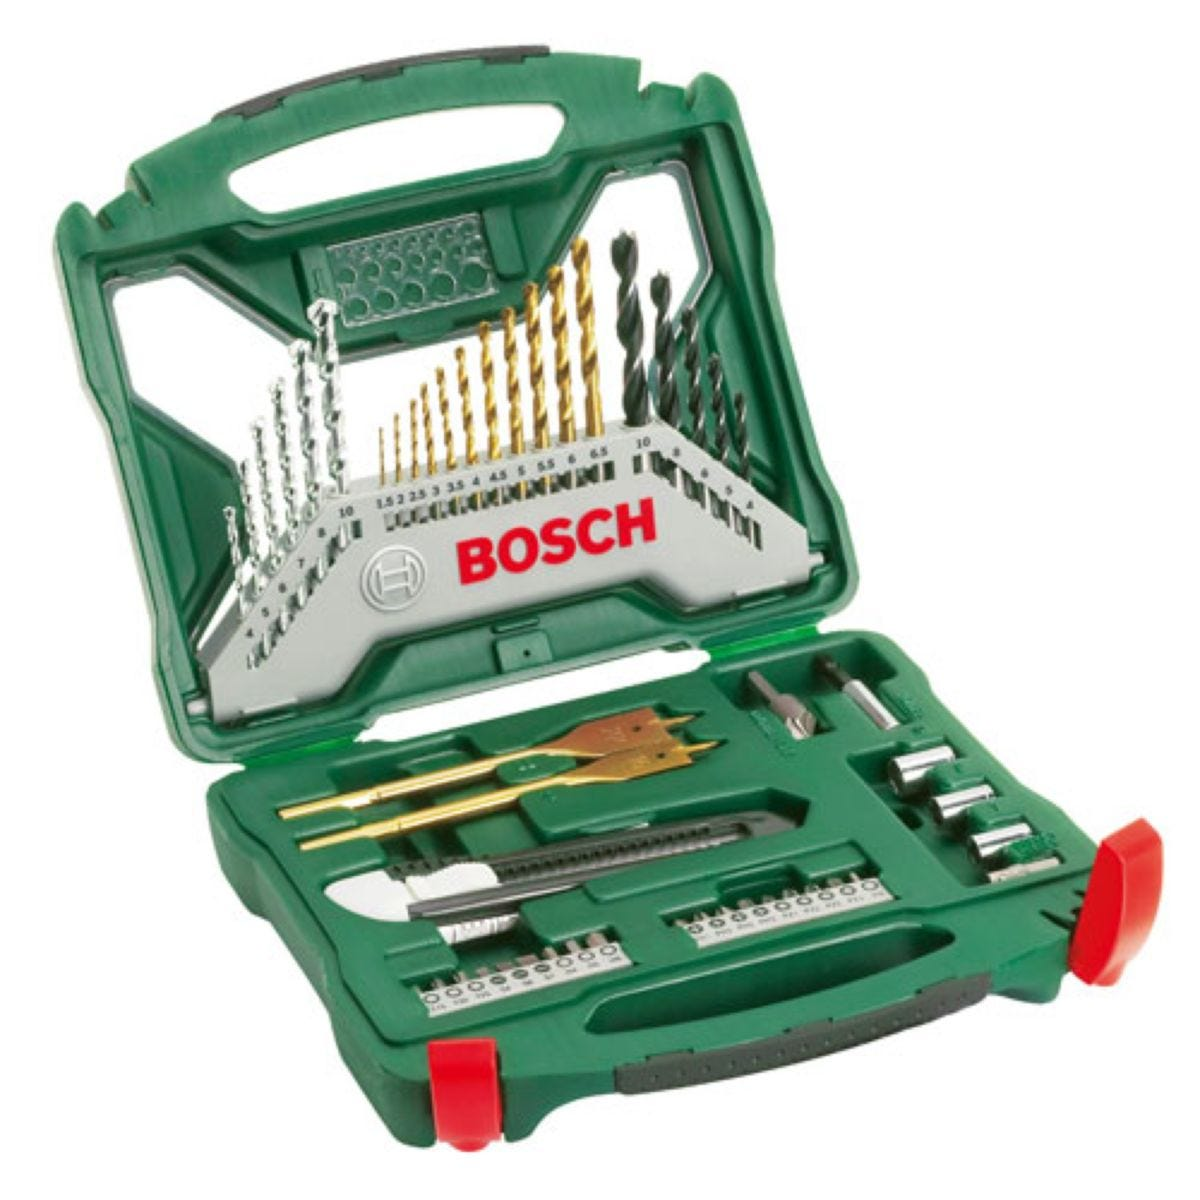 Bosch X-Line 50-Piece Drill and Screwdriver Accessory Set